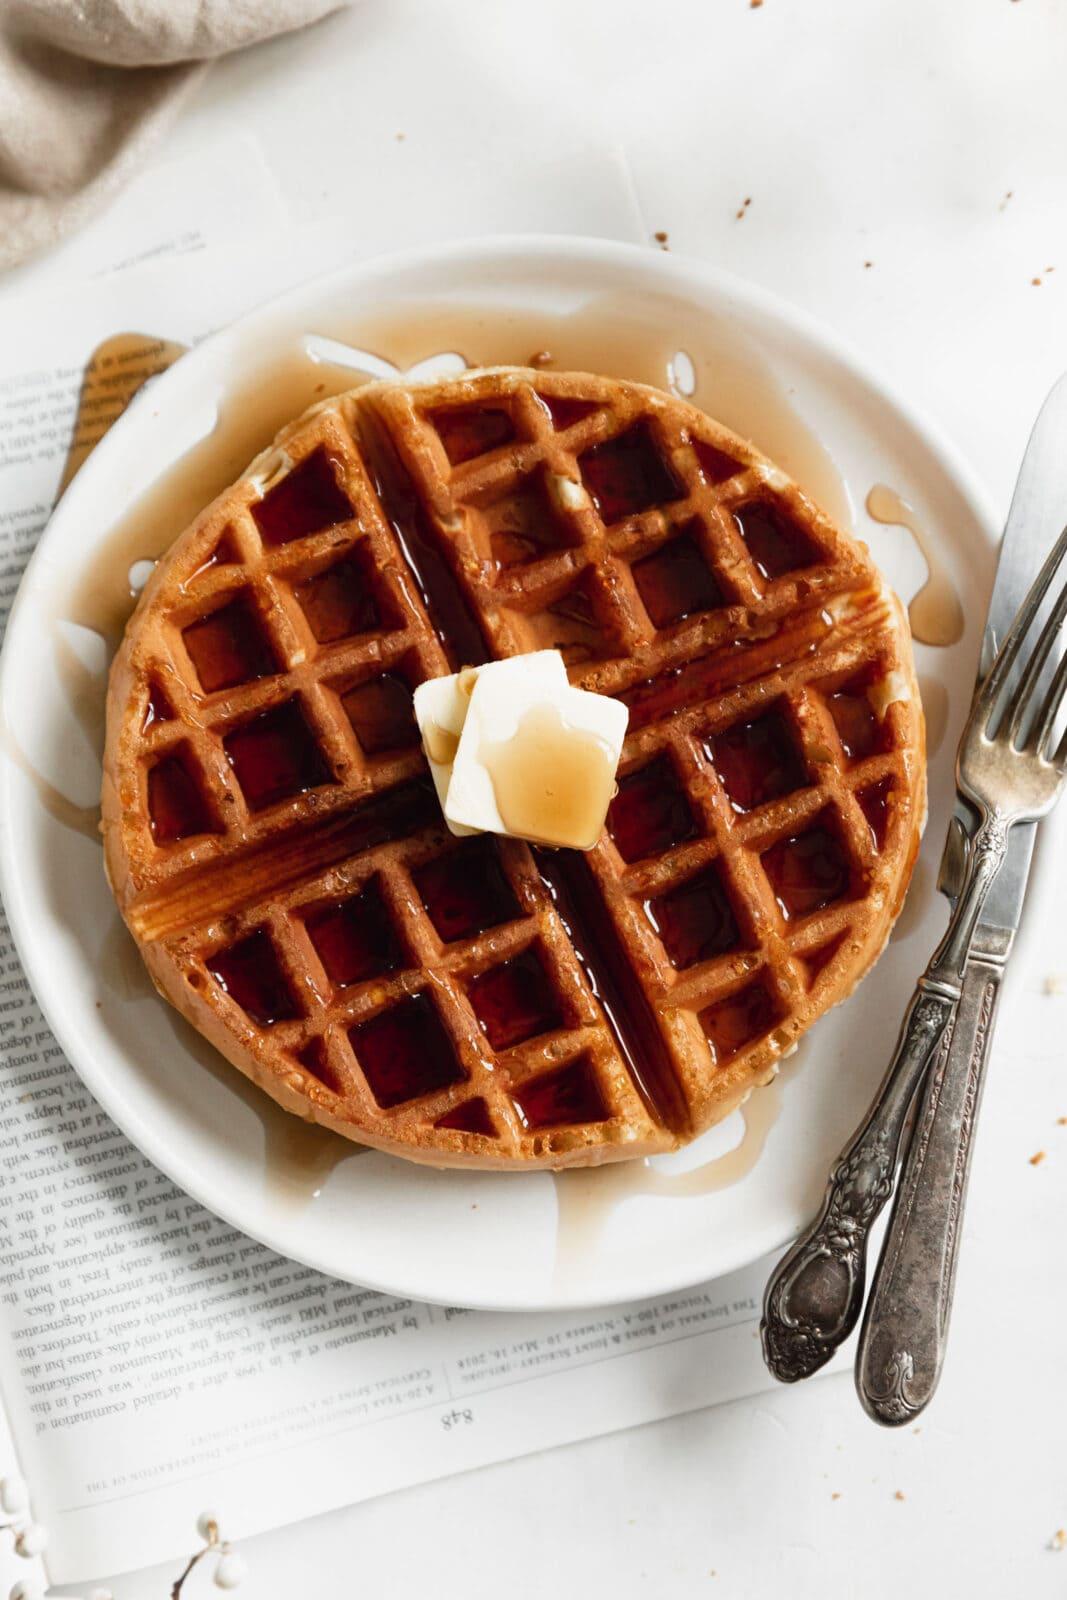 fuffy belgian waffles